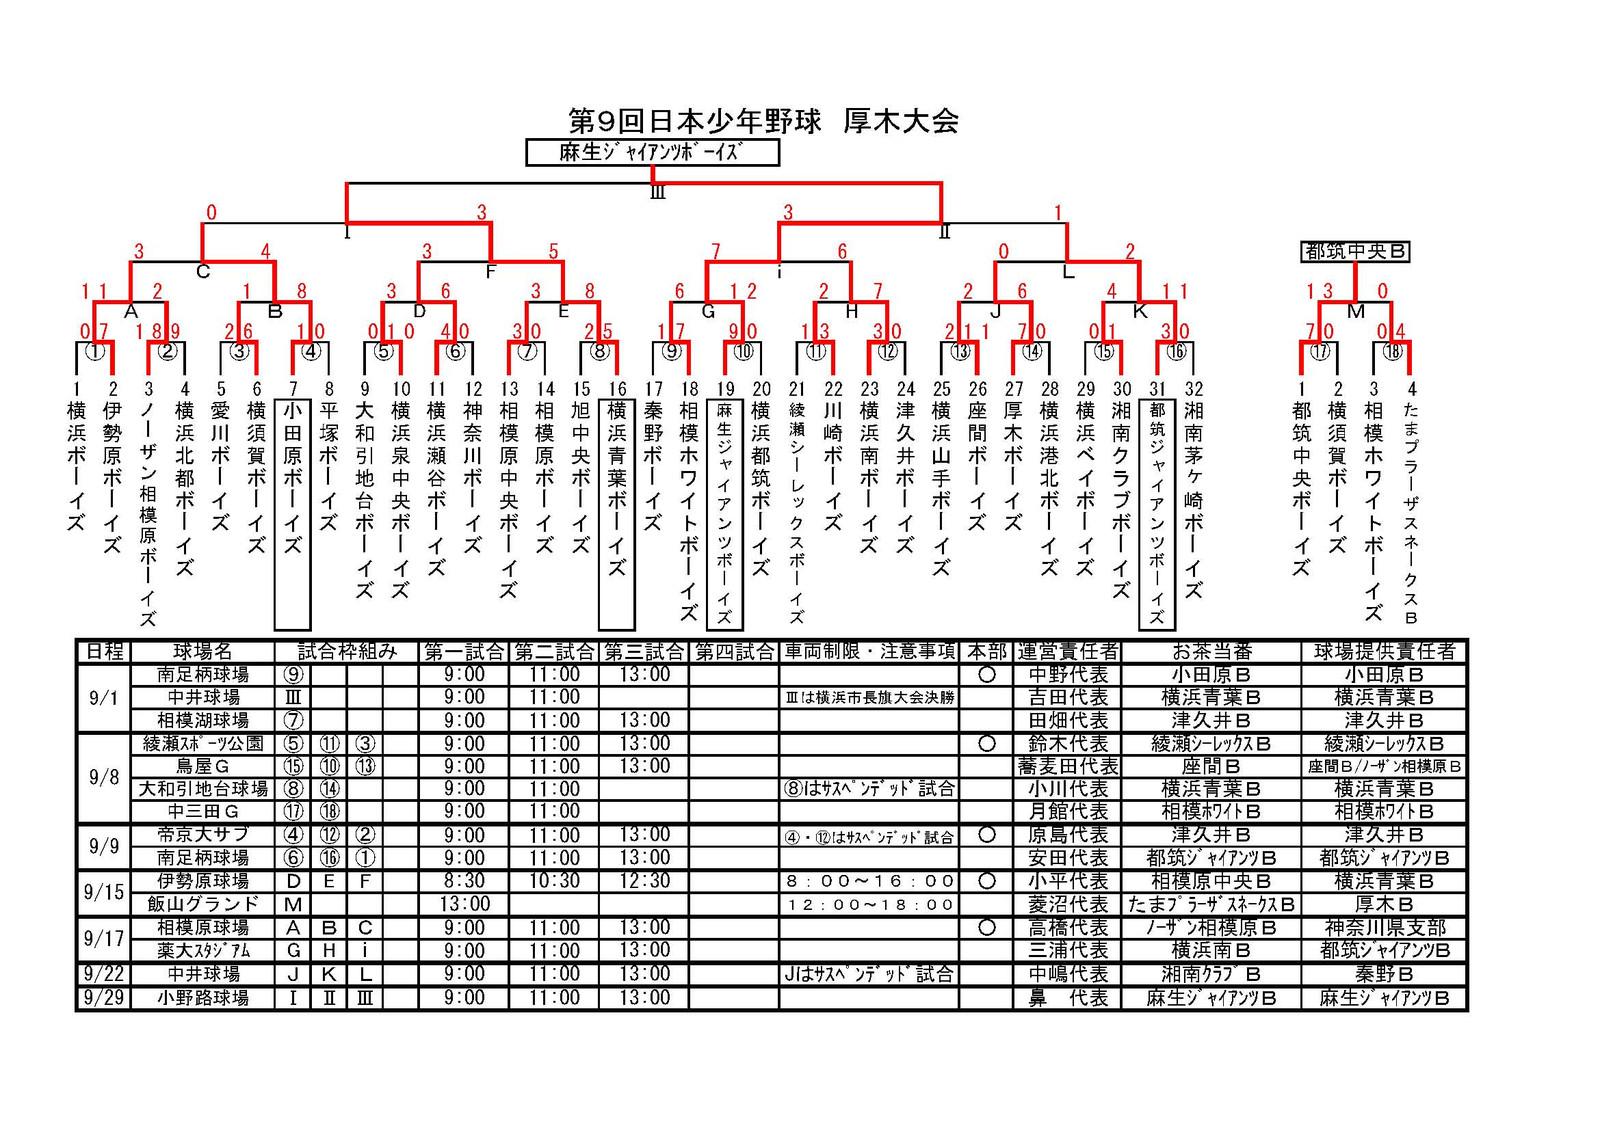 2012_atsugi_result